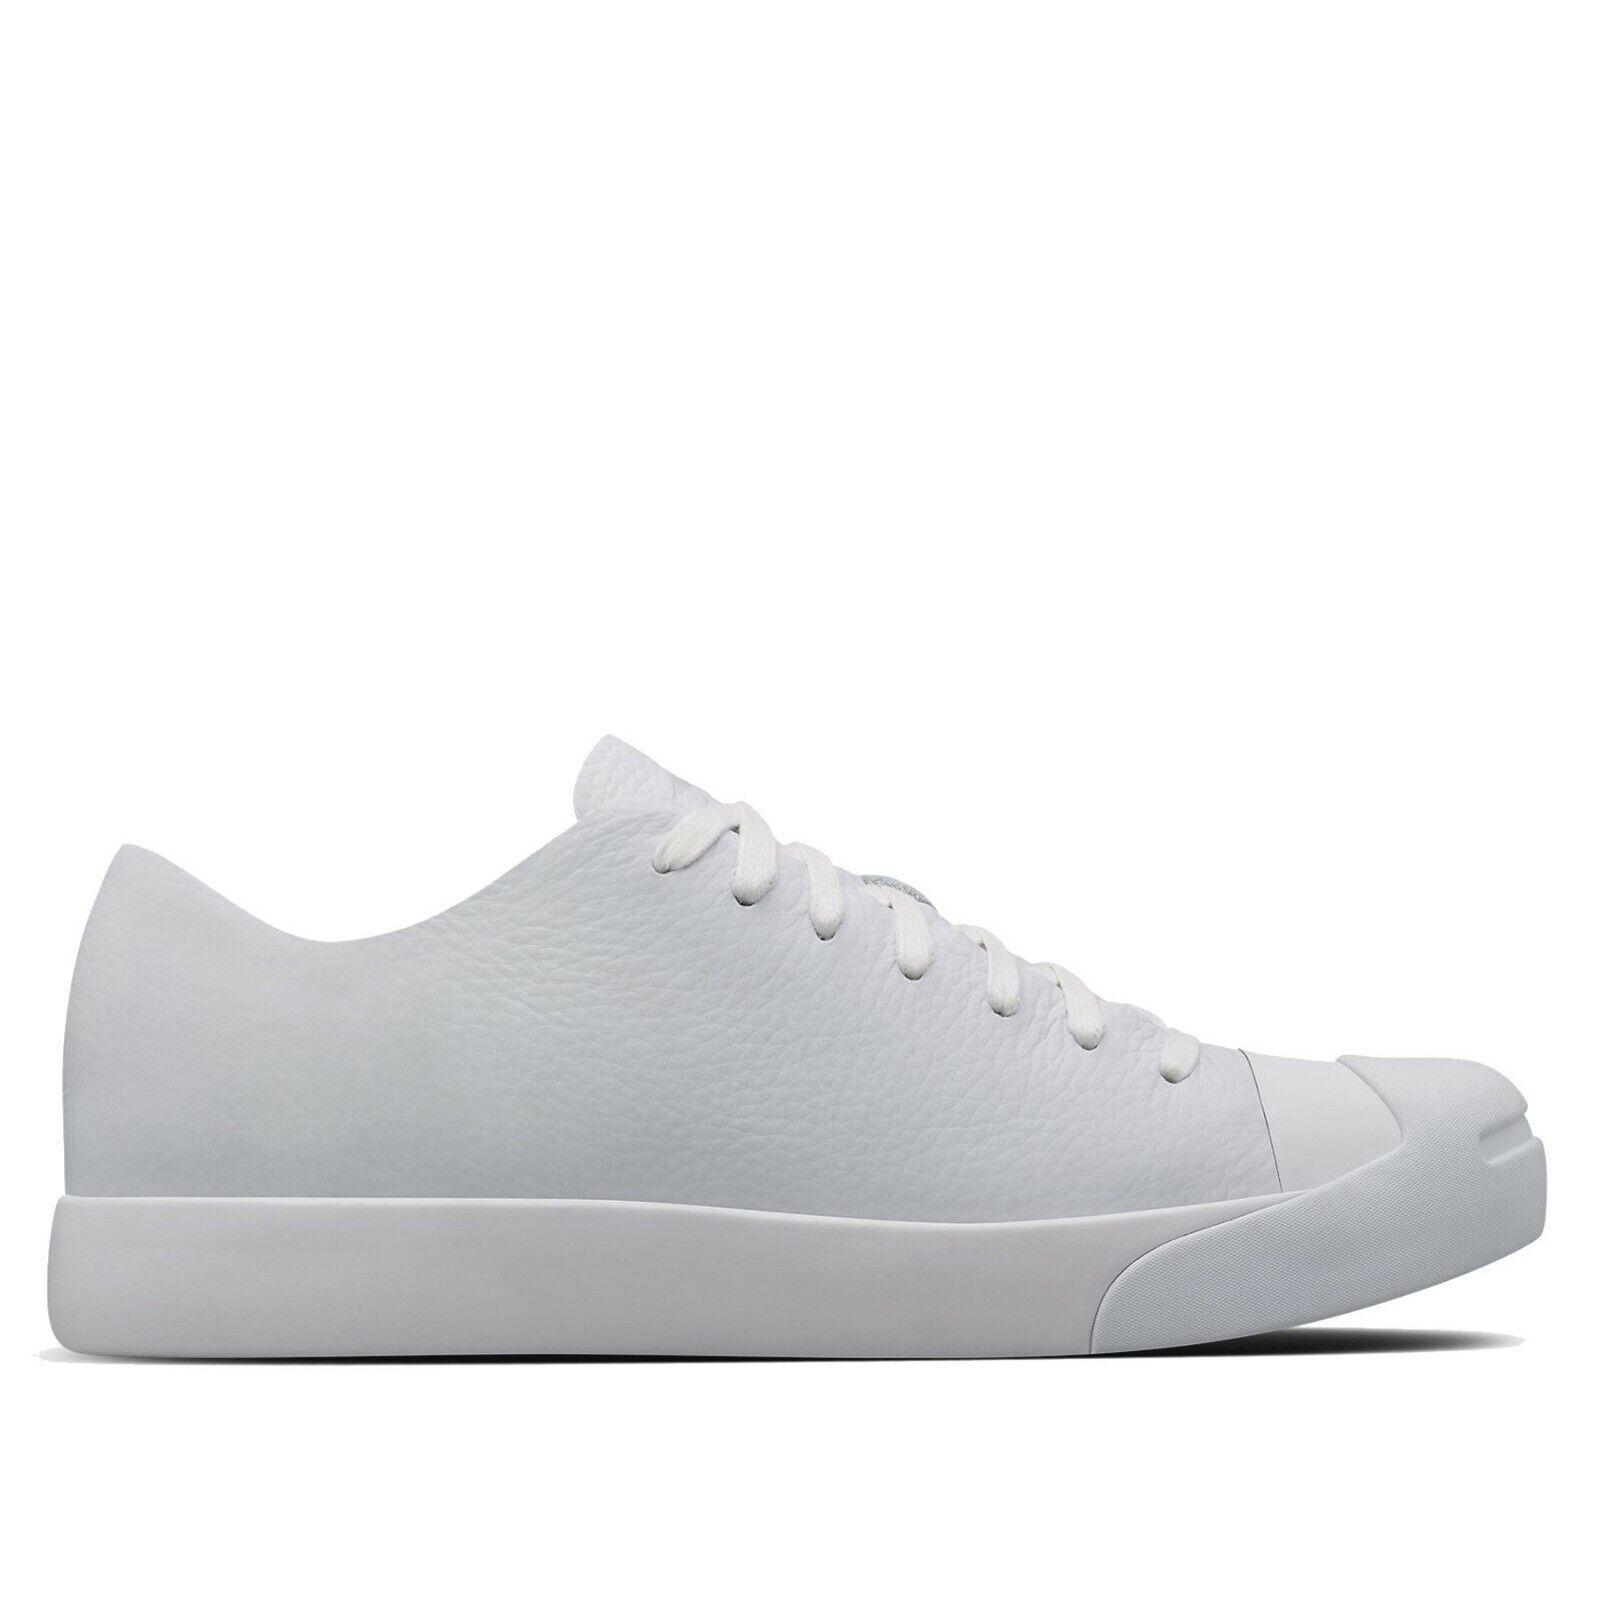 NIB  180 Converse X NikeLab Jack Purcell Modern HTM Ox White 155019C US Mens12.5